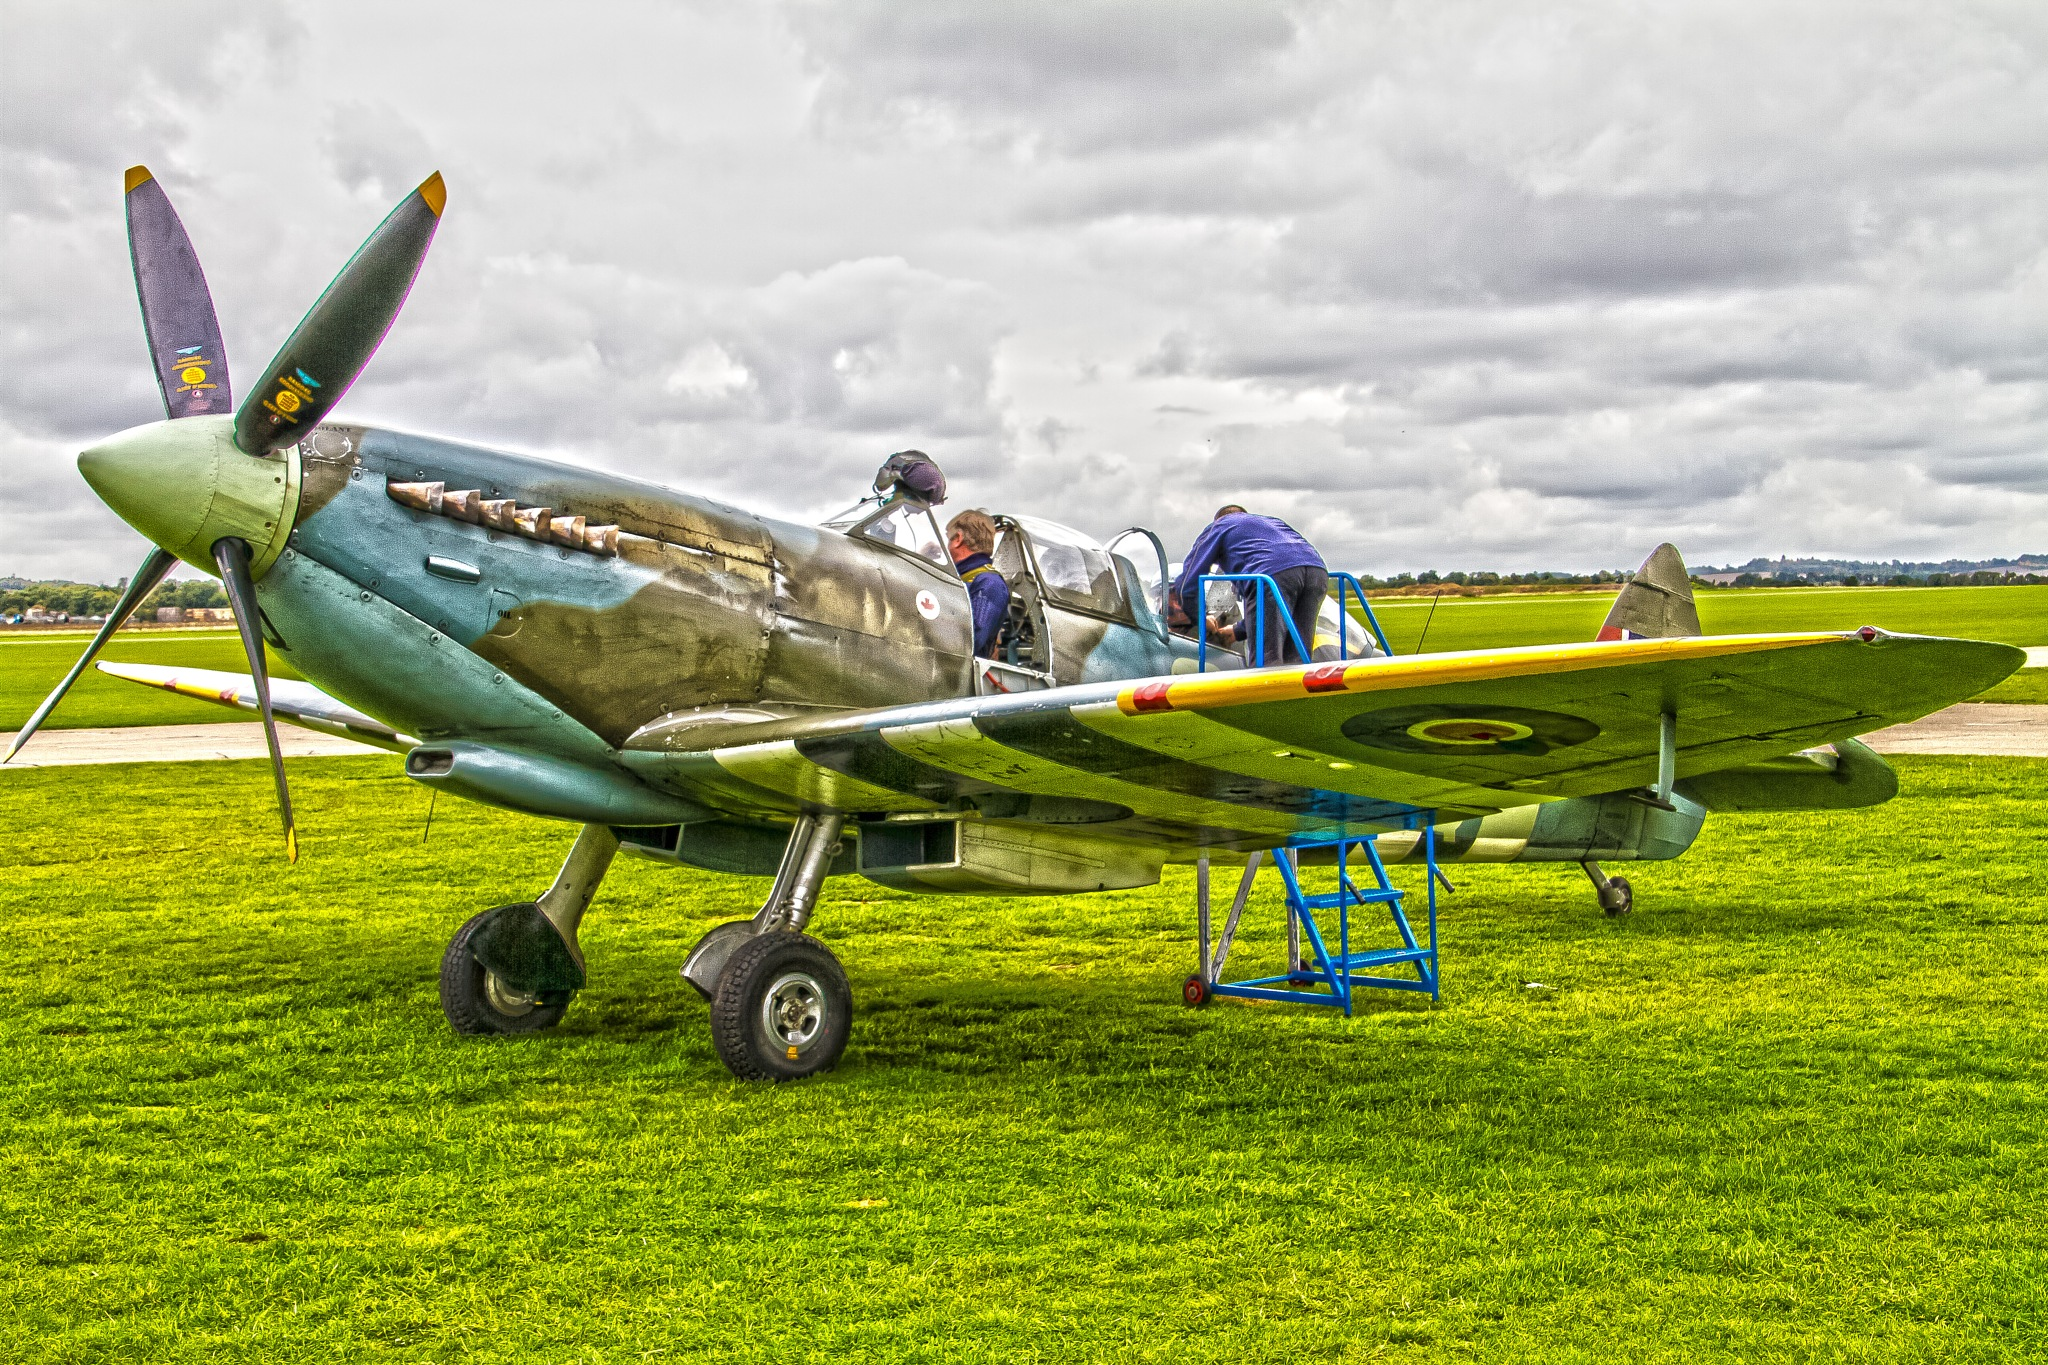 spitfire 1 by pat hopkins